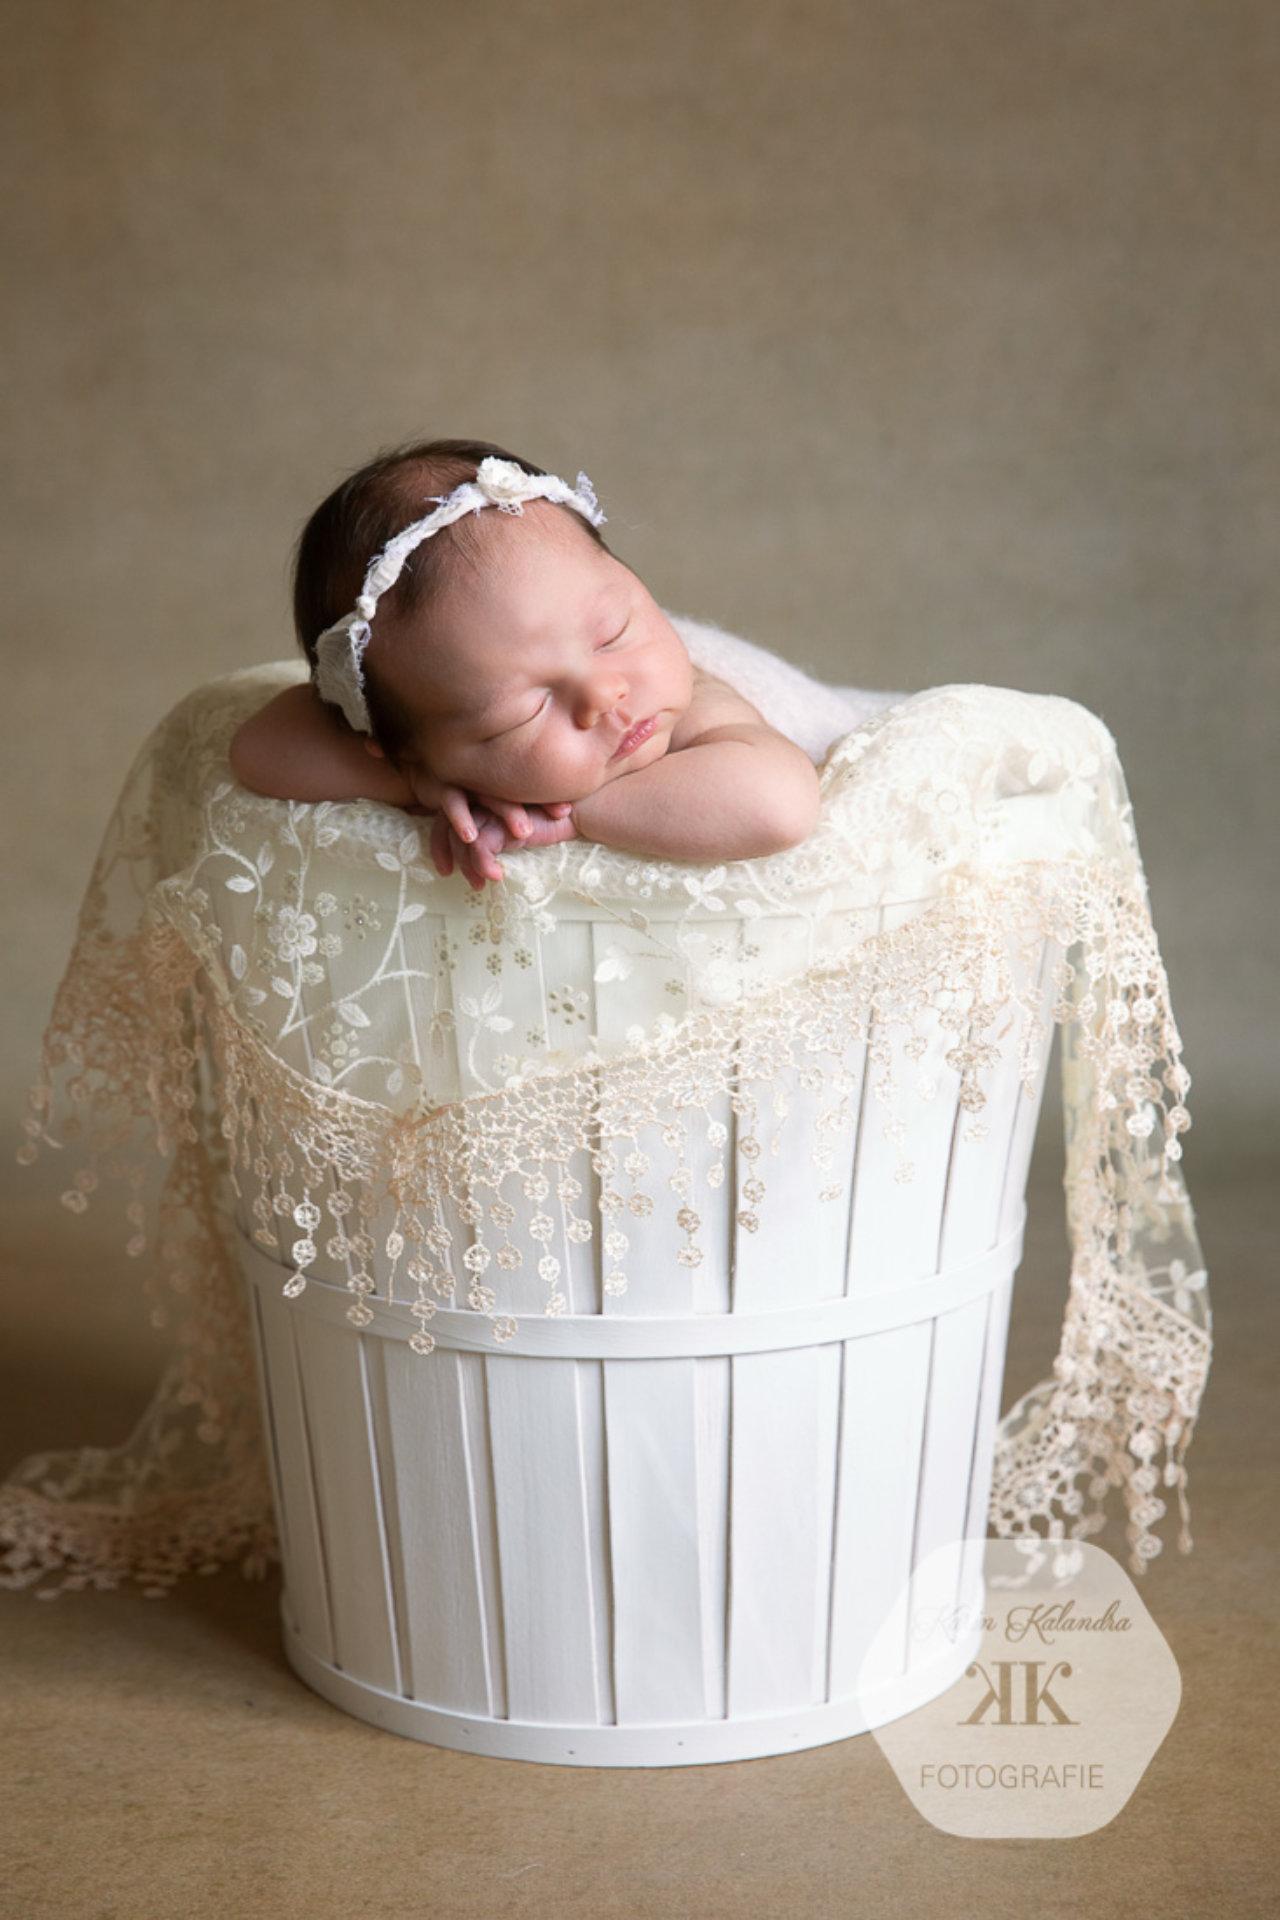 Newborn-Fotografie #5